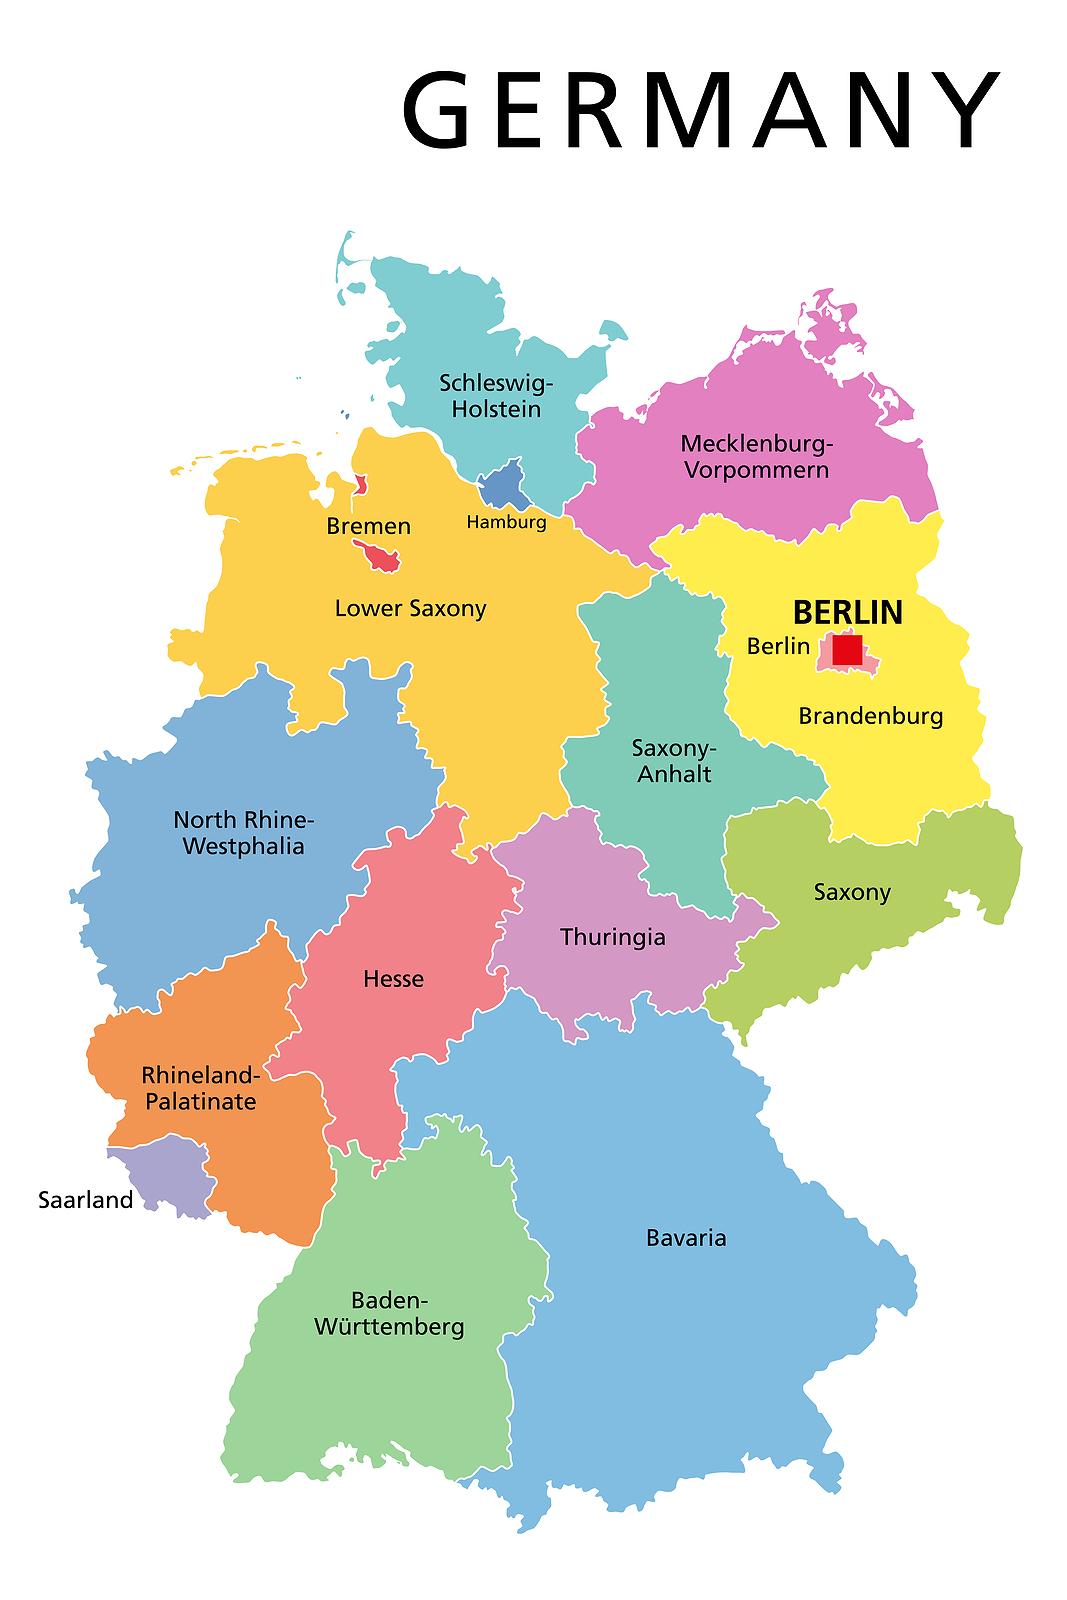 German Lands